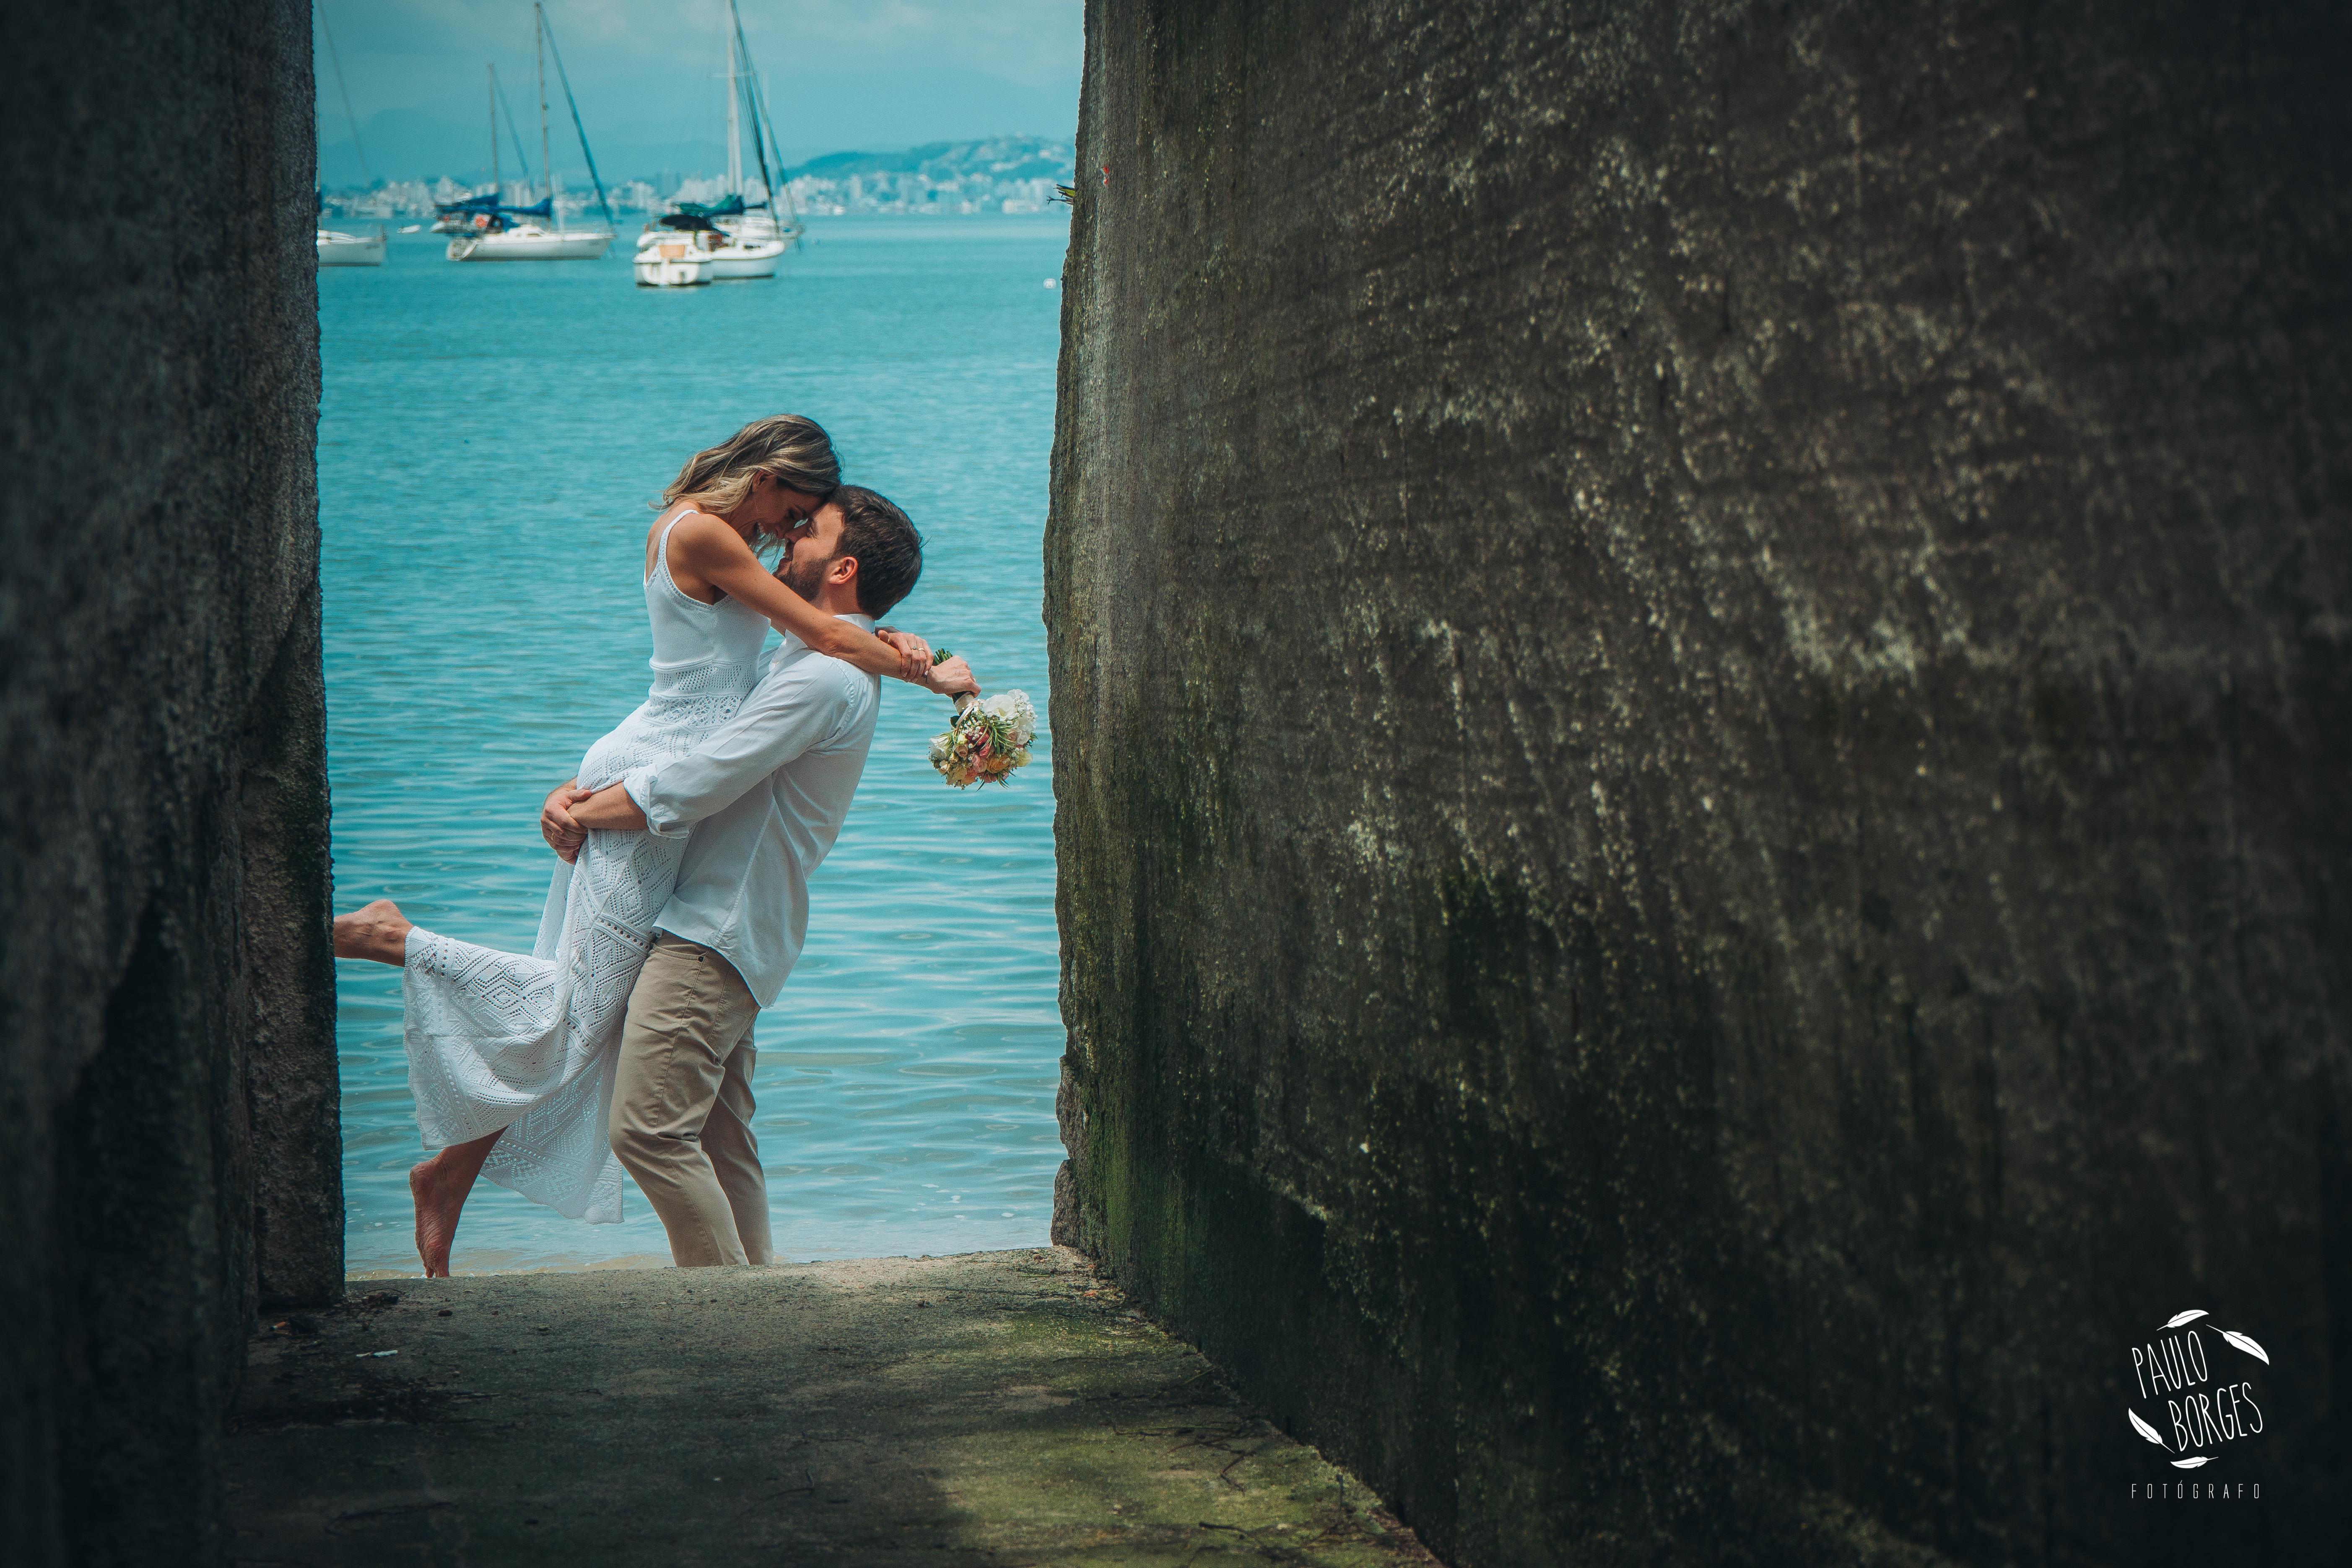 Contate Fotógrafo de casamento Blumenau- sc / Paulo Borges